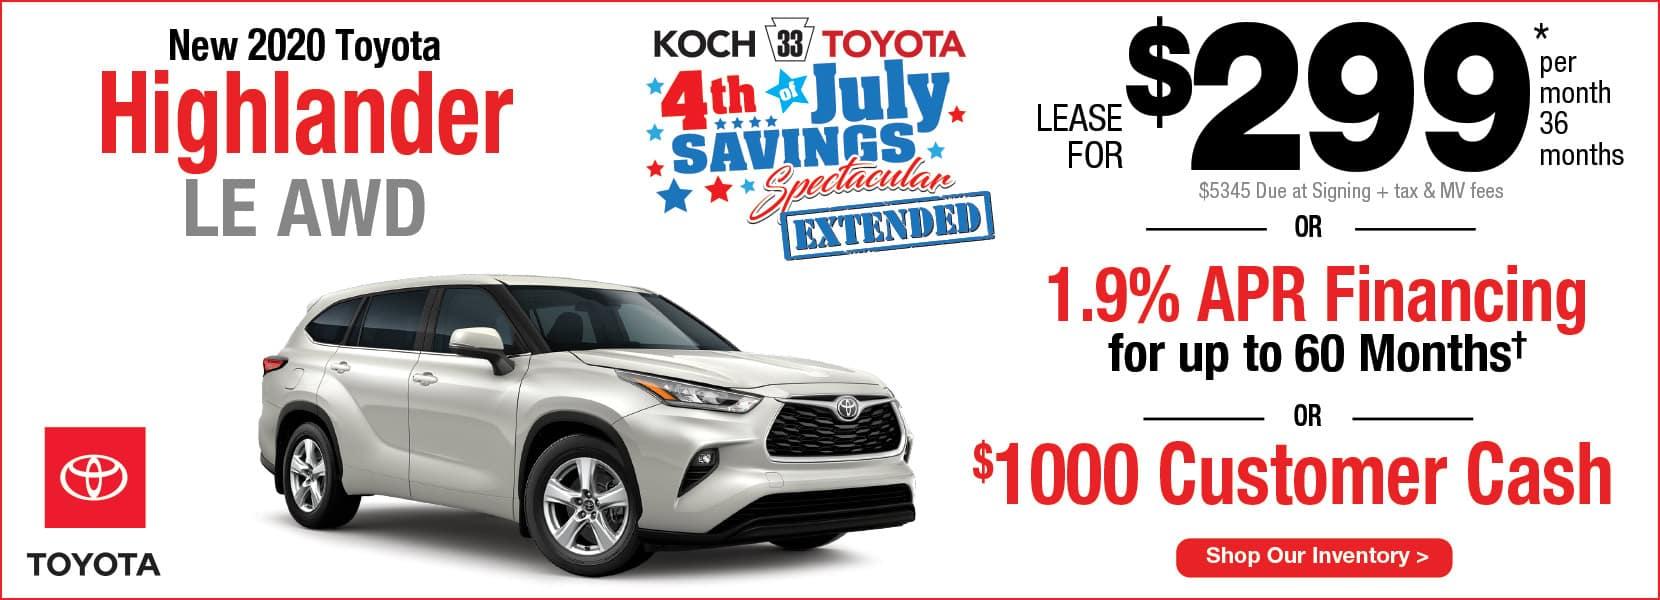 New 2020 Toyota Highlander Lease Koch 33 Toyota Easton PA